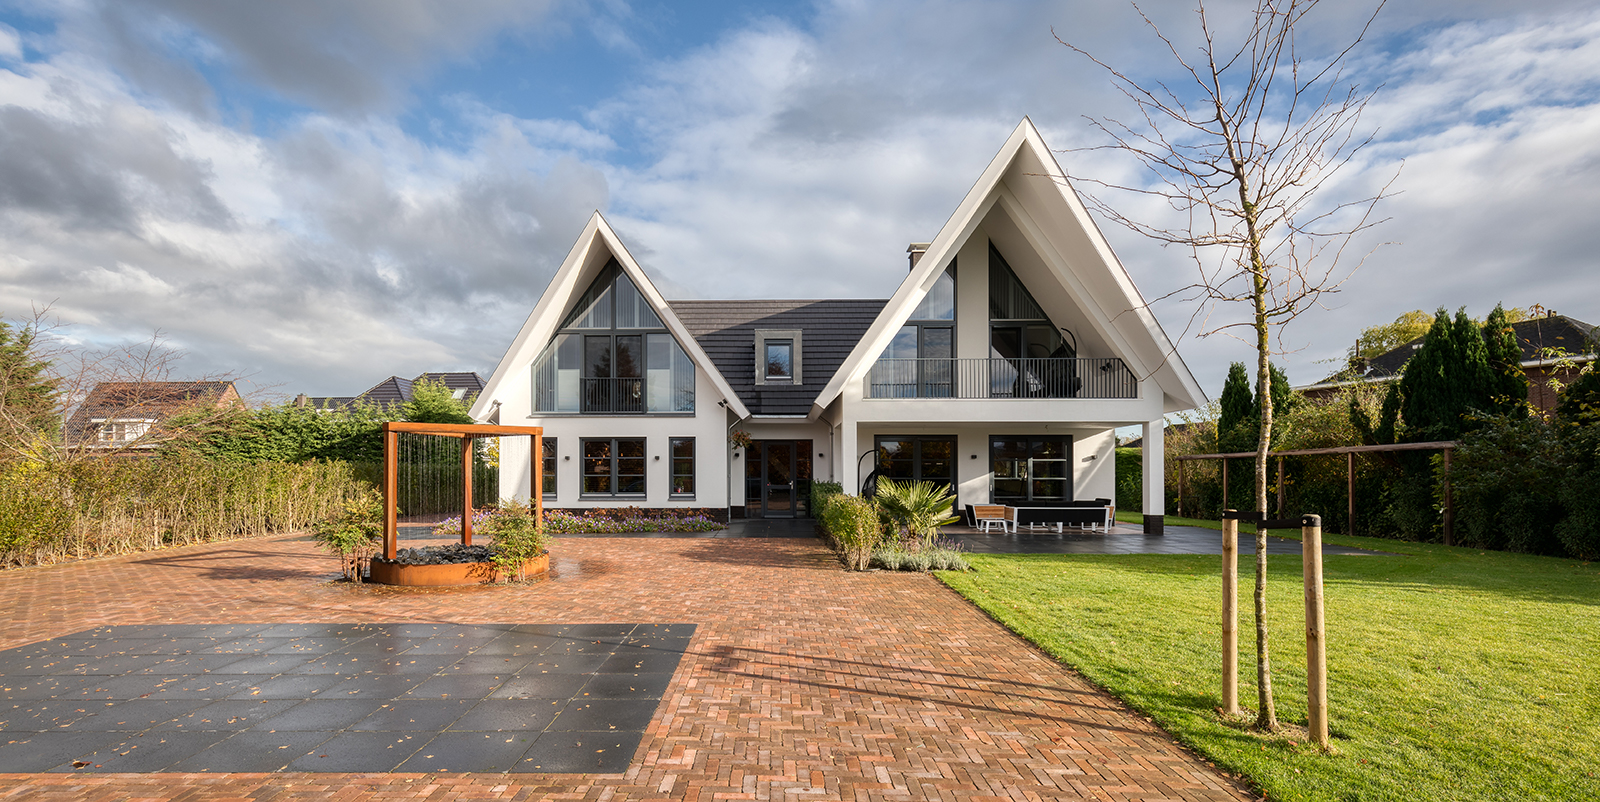 brand bba architecten, duurzame woning